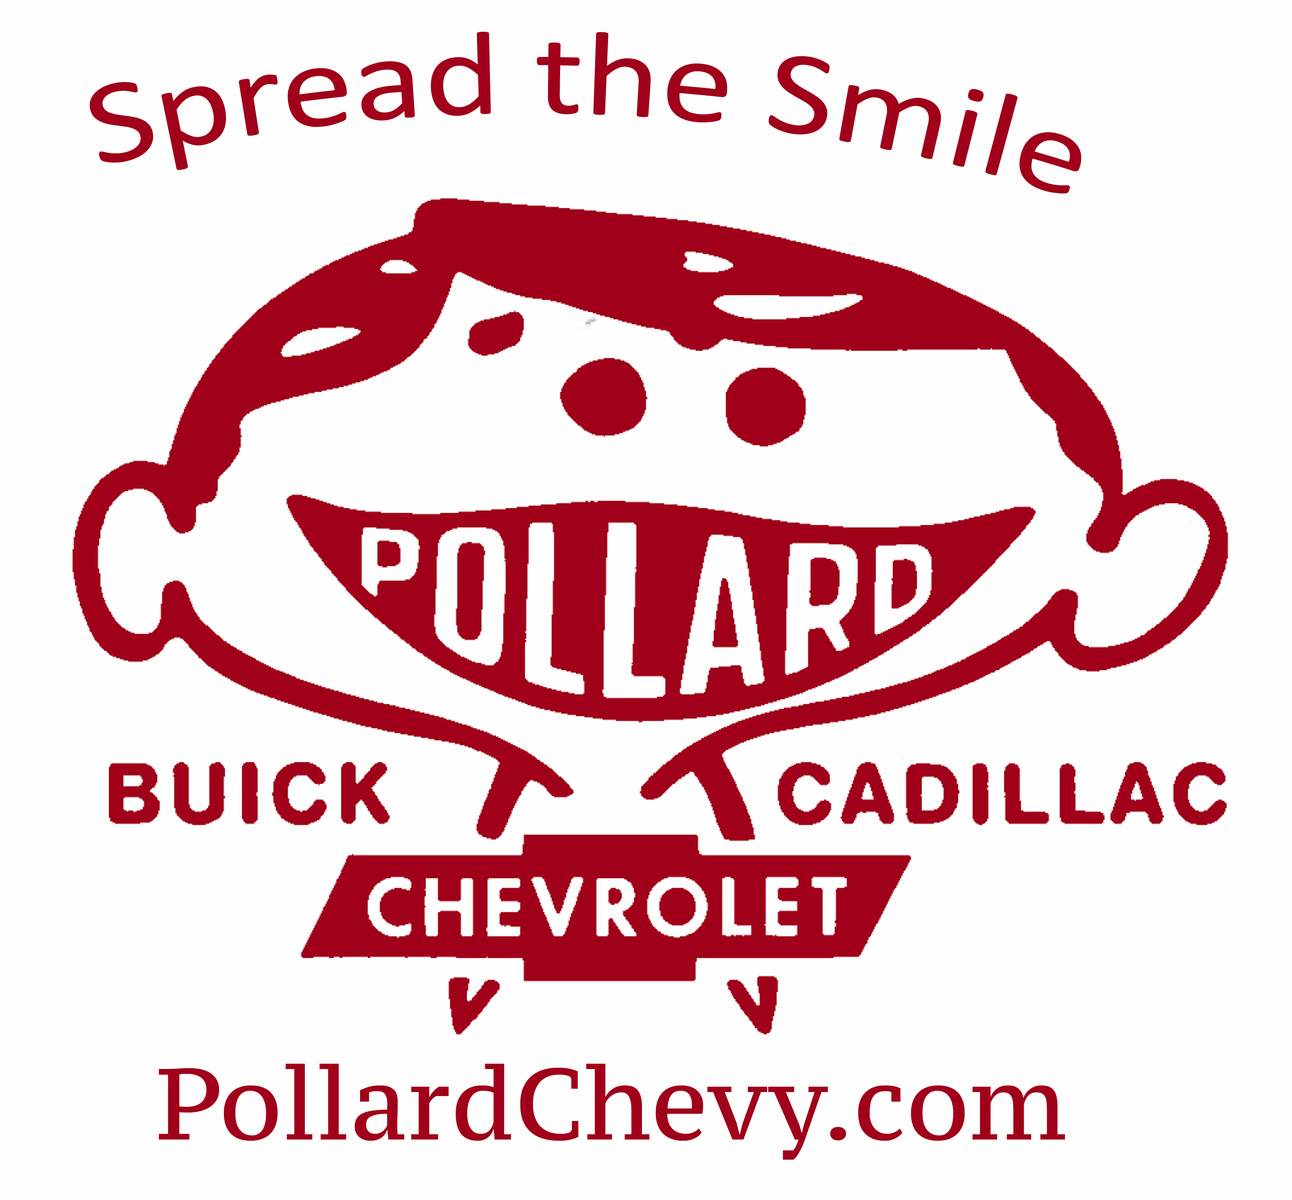 Buick Dealership Austin: Pollard Chevrolet Buick Cadillac